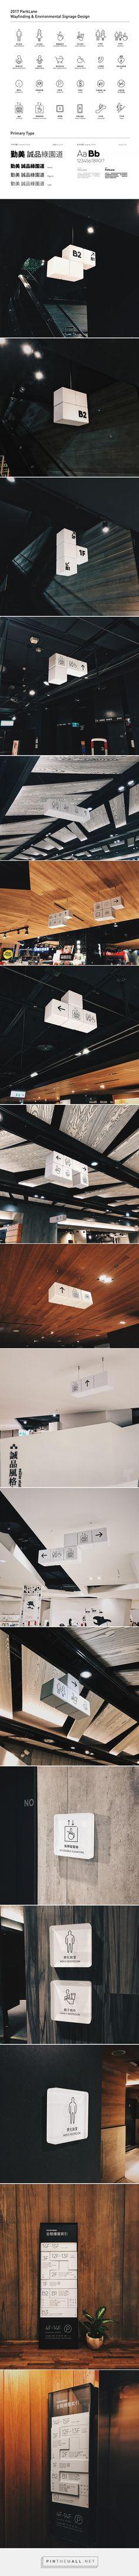 2017 ParkLane Wayfinding&Environmental Signage Design on Behance - created via https://pinthemall.net